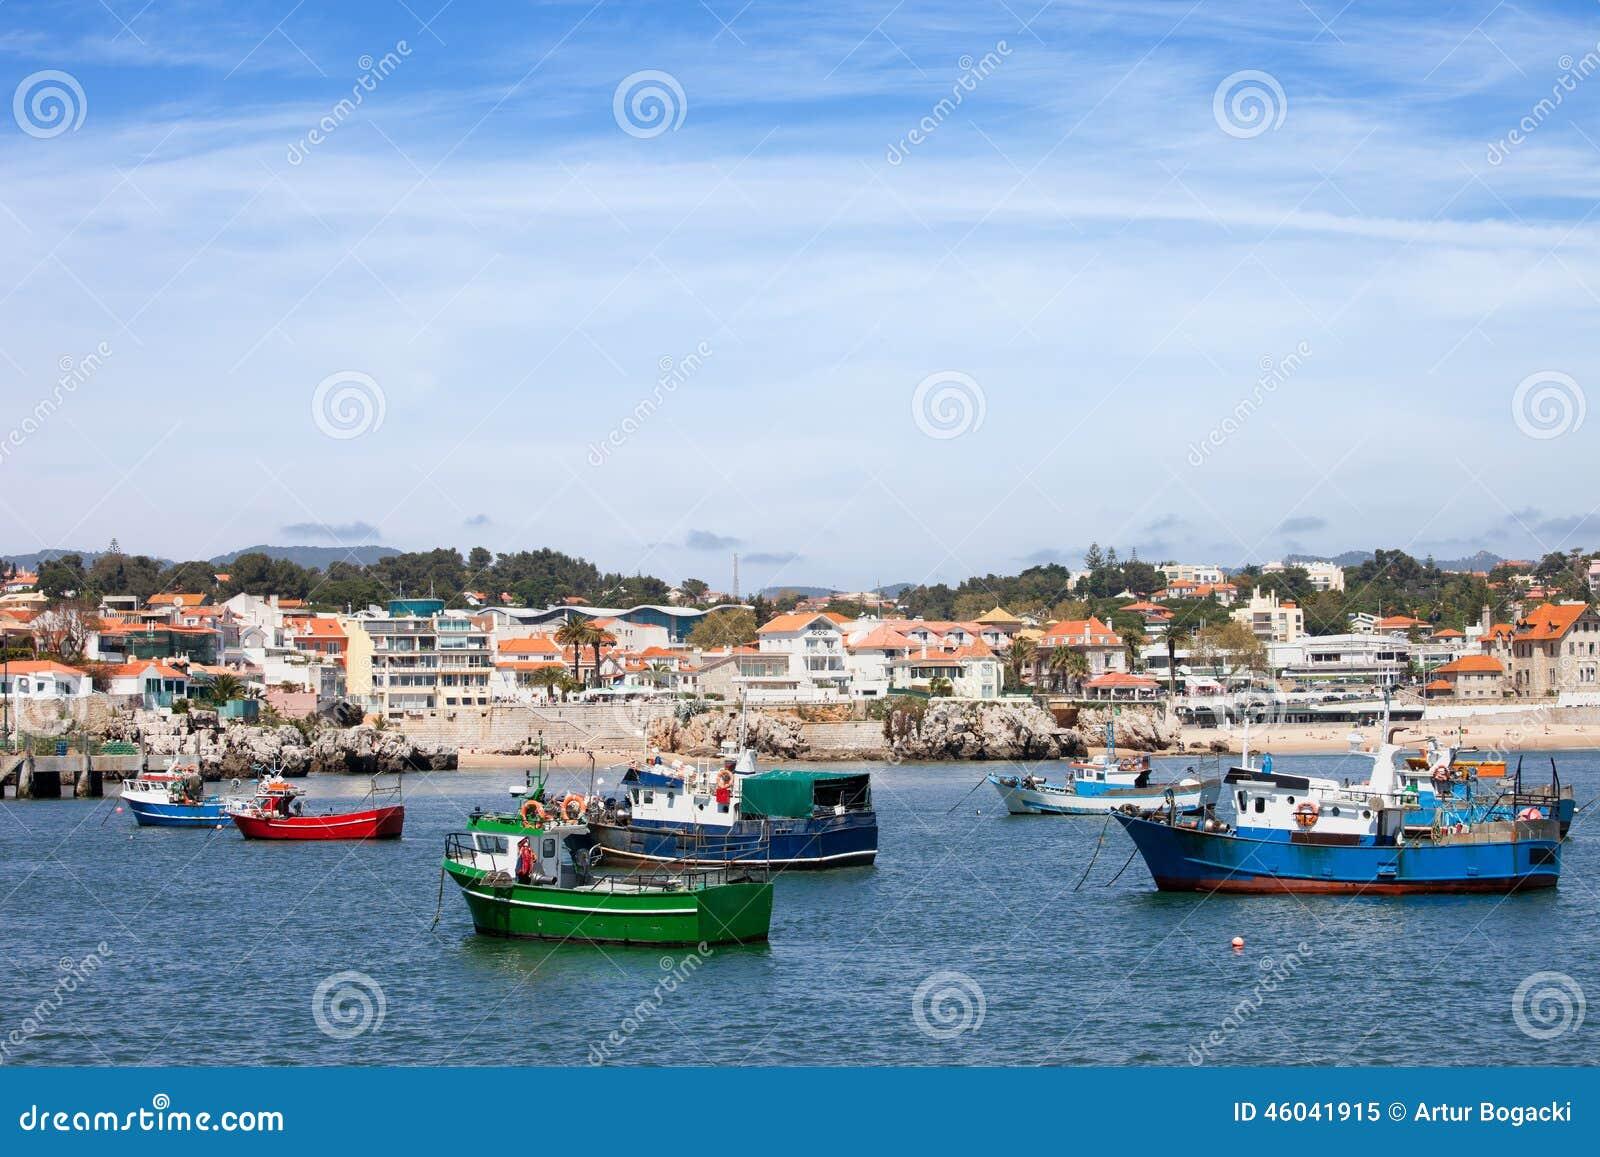 Barcos de pesca y costa costa de Cascais en Portugal